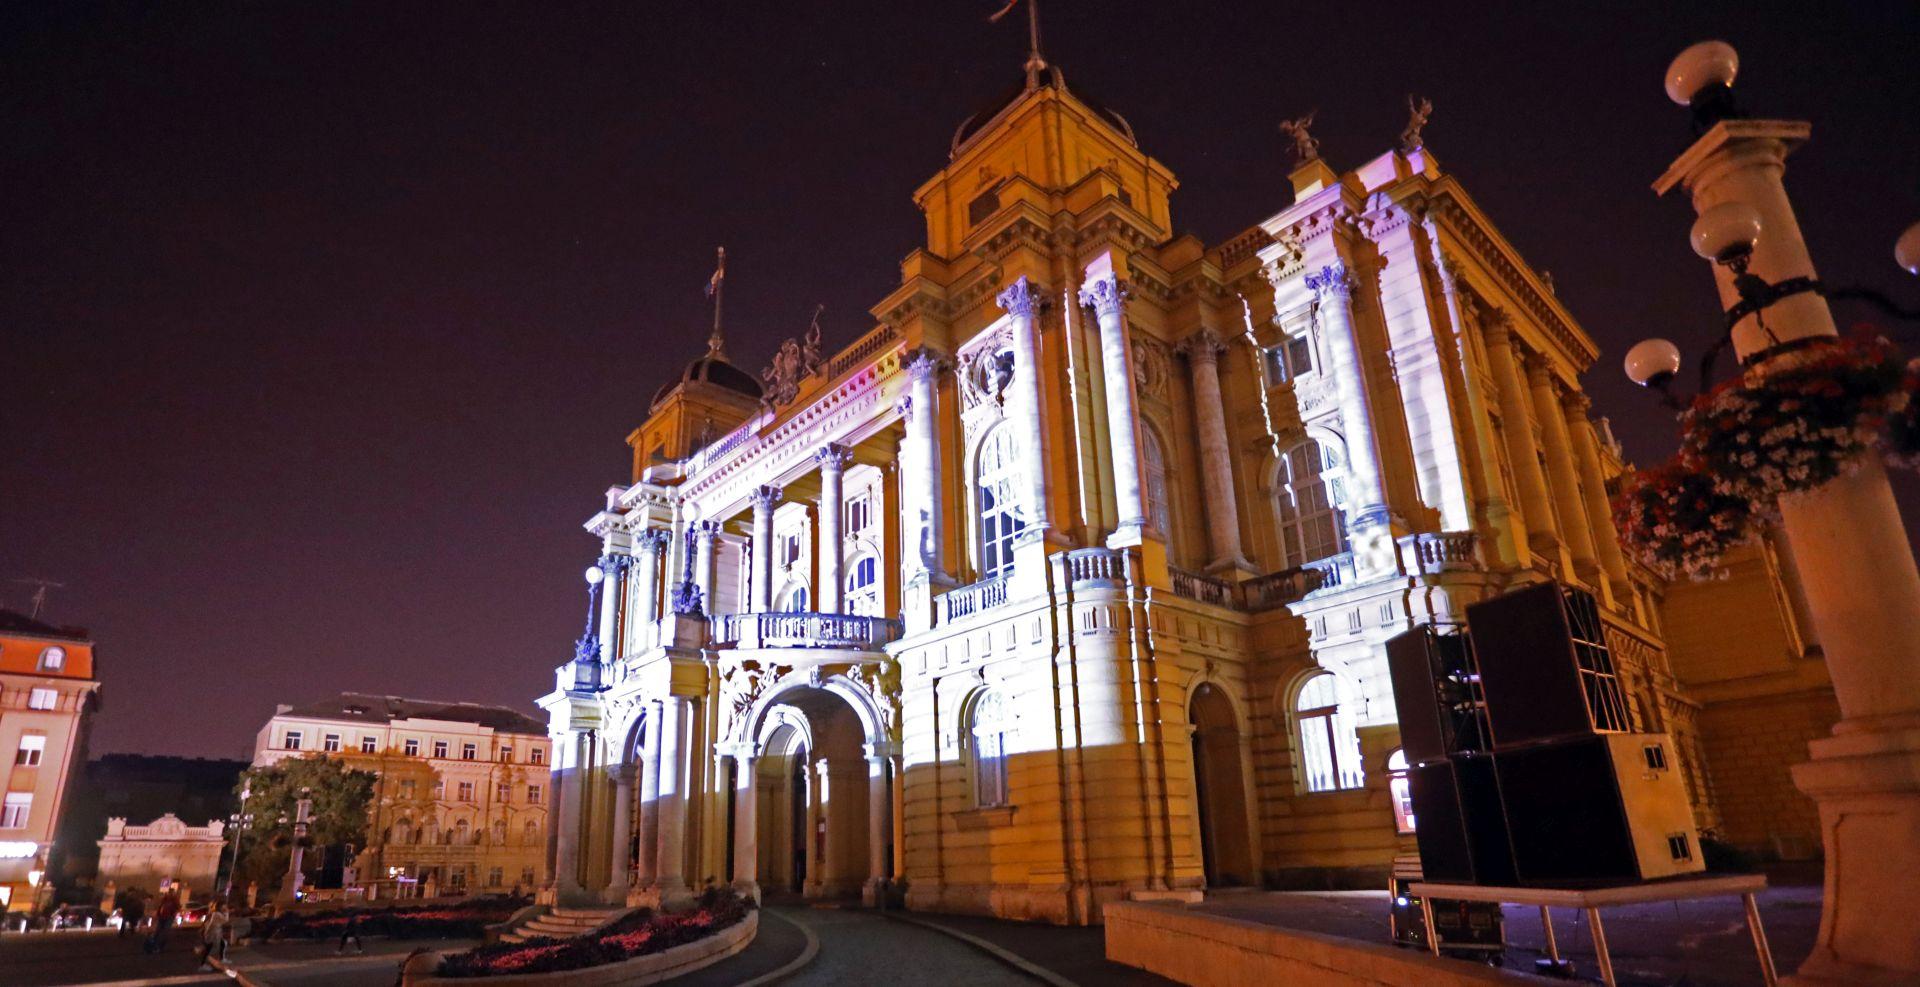 Balet zagrebačkog HNK u slavnom Aleksandrinskom teatru